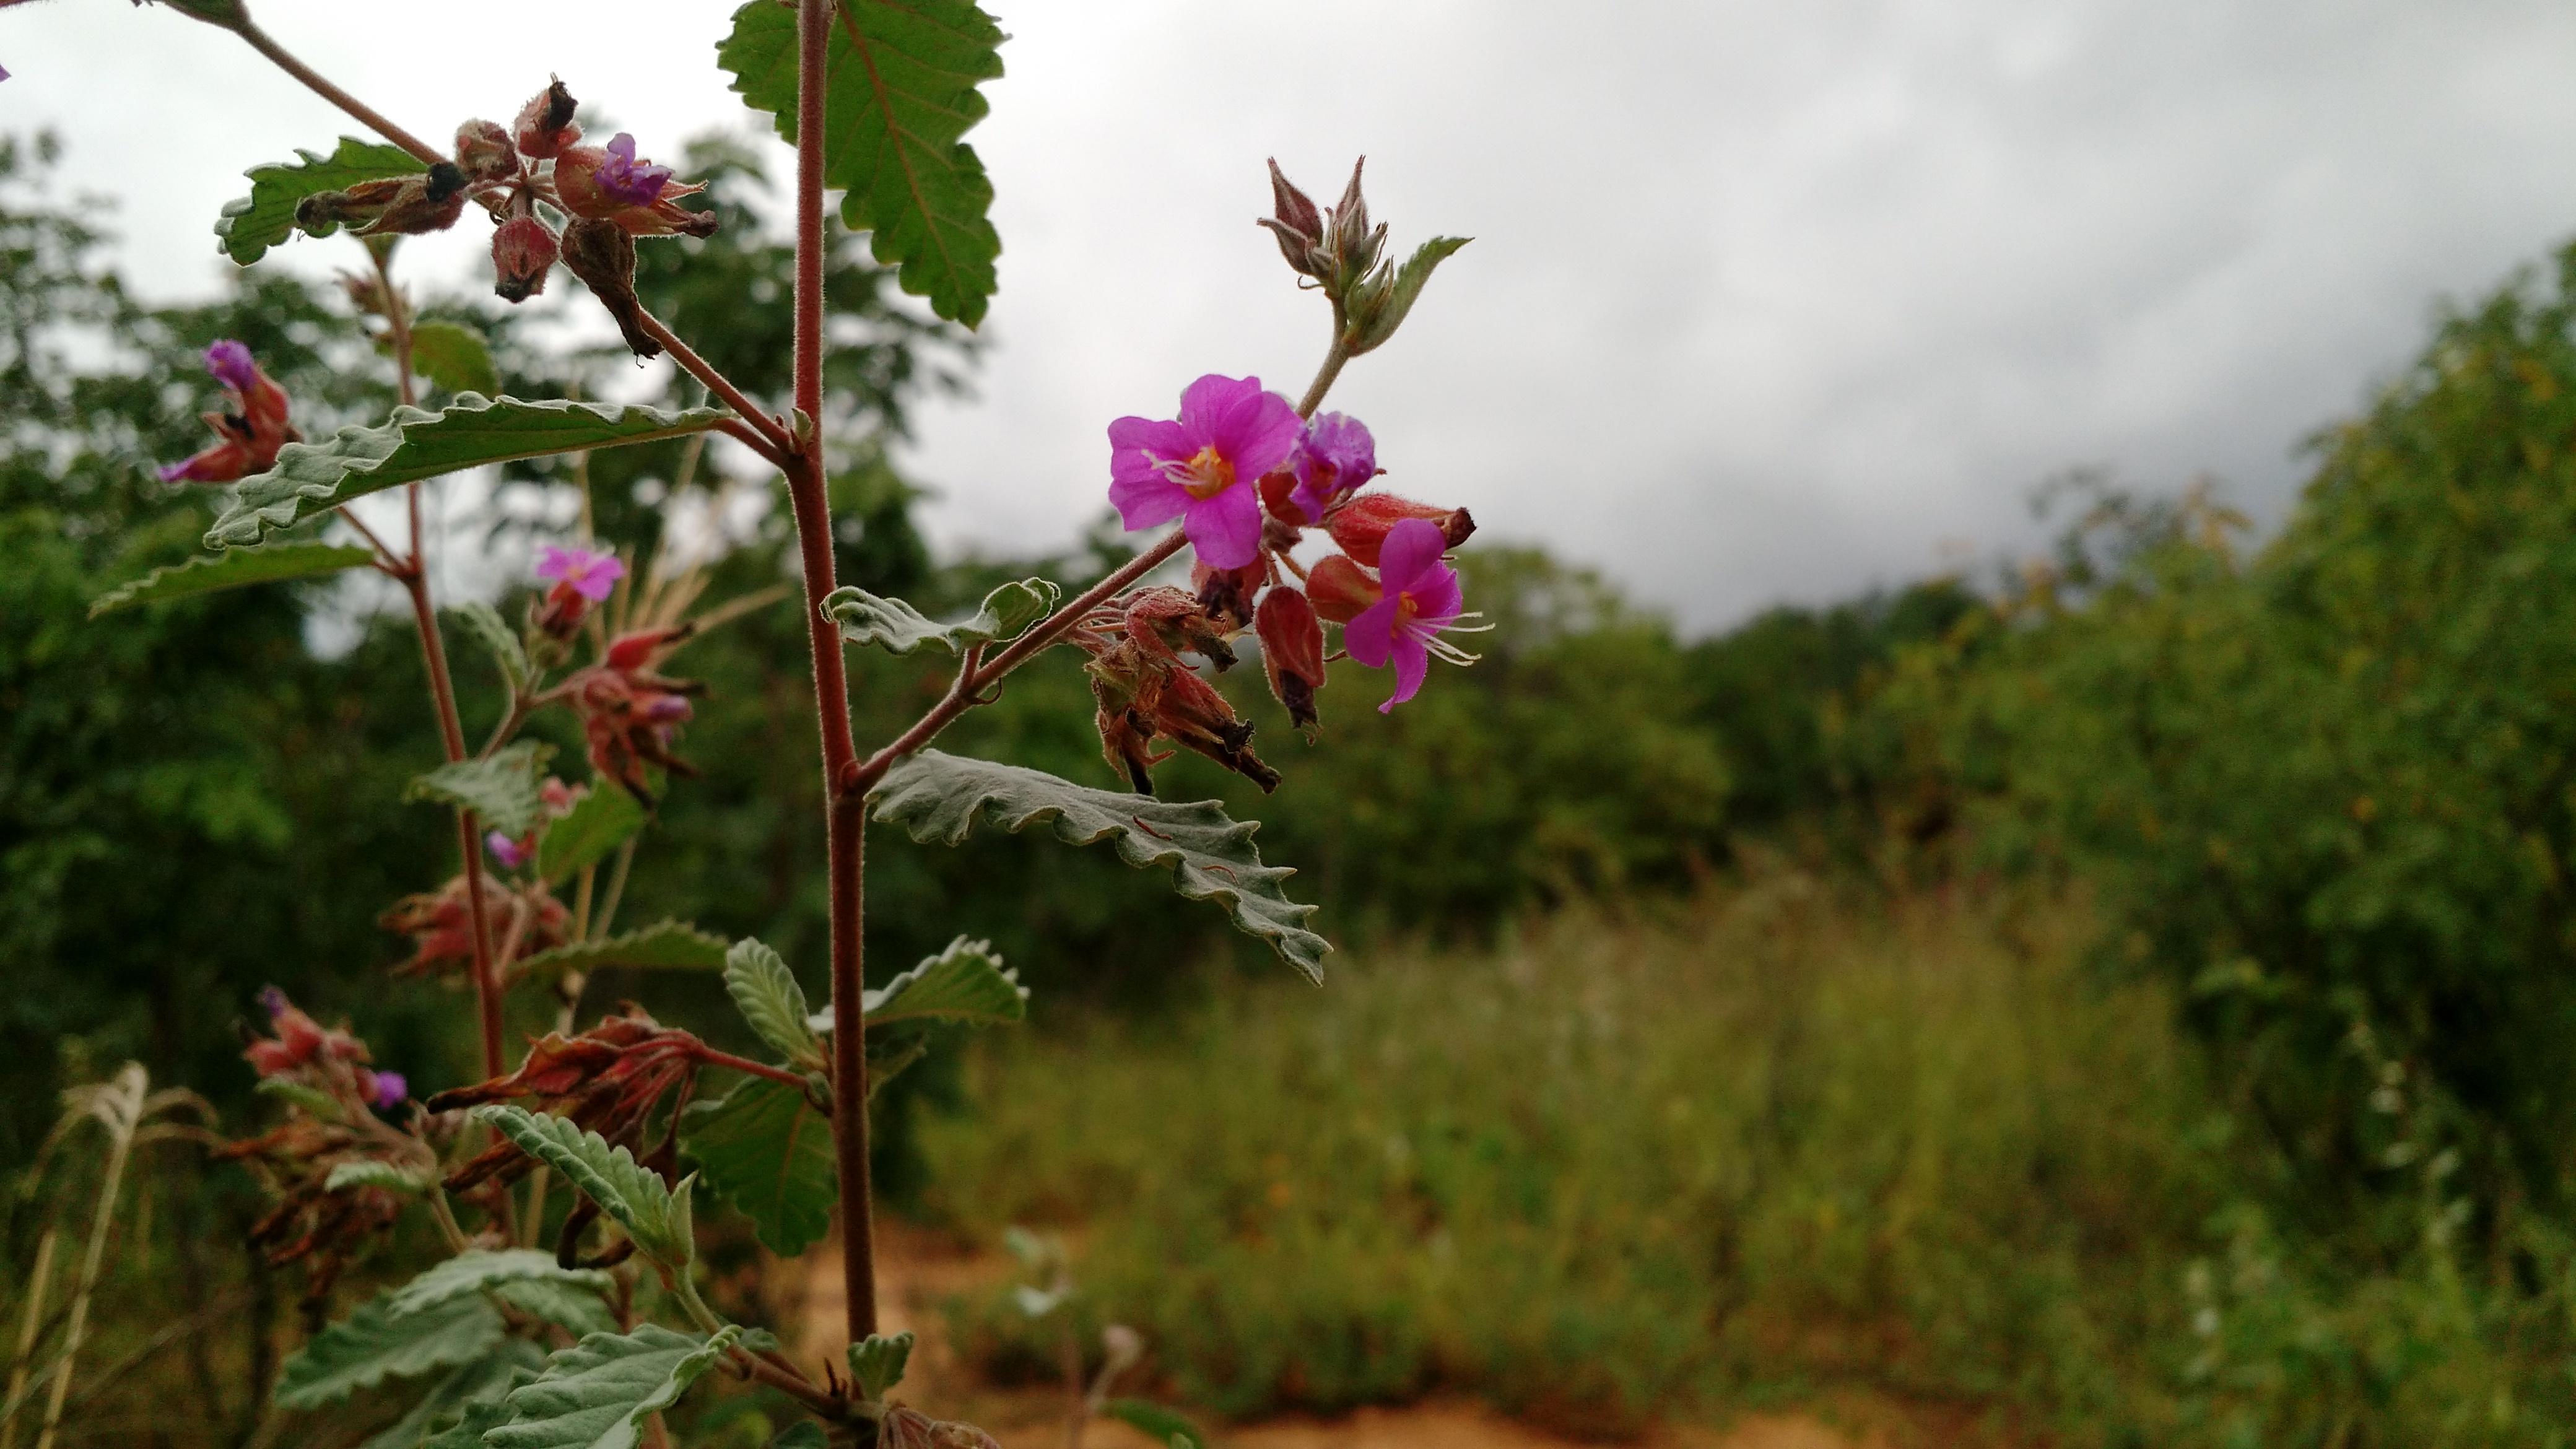 Fileflor De Arbustosjpg Wikimedia Commons - Arbustos-de-flor